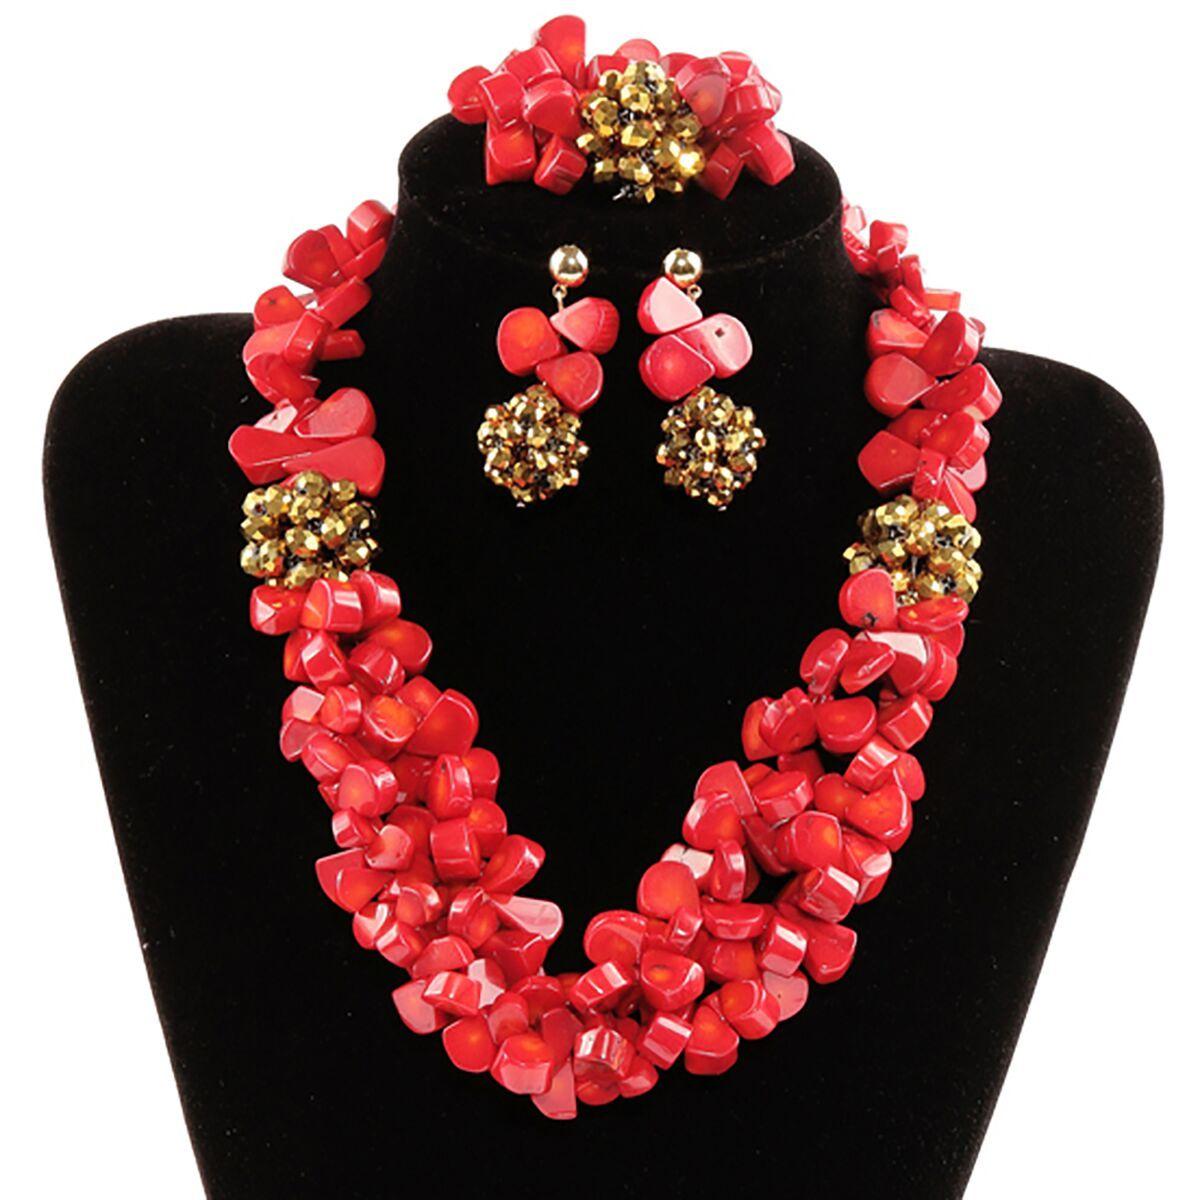 African Jewellery Set #prestigeapplause #jewelleryset #bestpoke #newfashion #beautiful #girlbestfriend http://www.prestigeapplause.com/